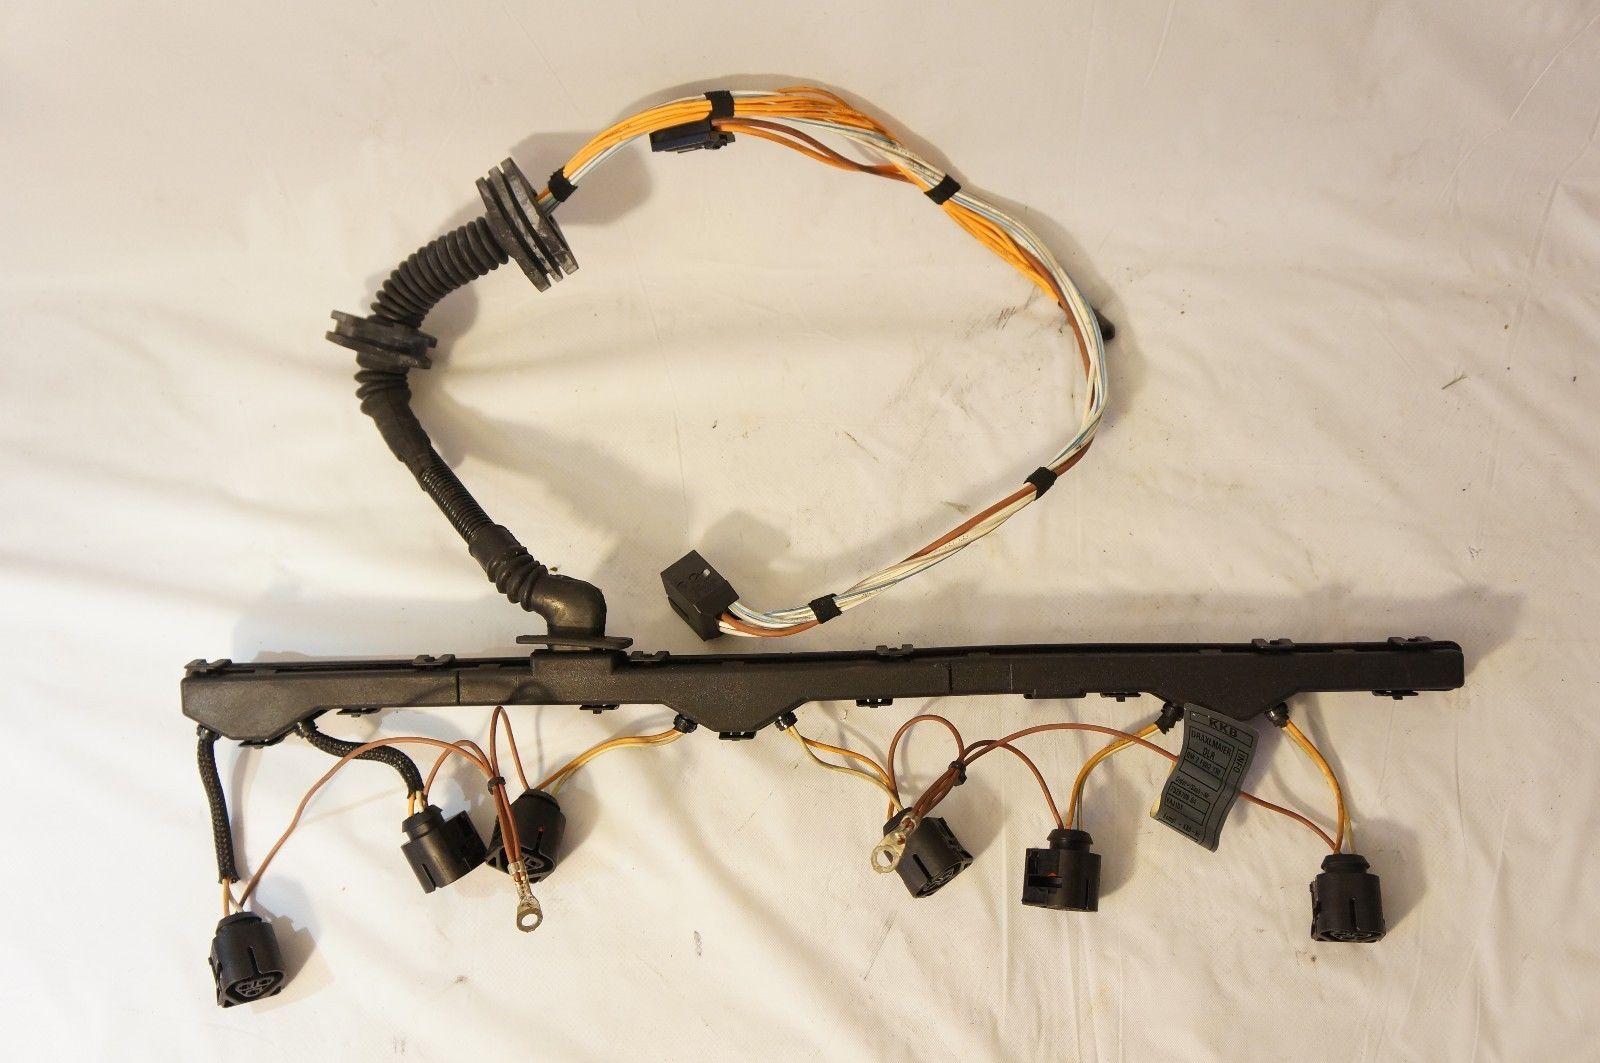 hight resolution of 57 57 previous 2004 2005 bmw e60 530i engine spark plug coil wire harness